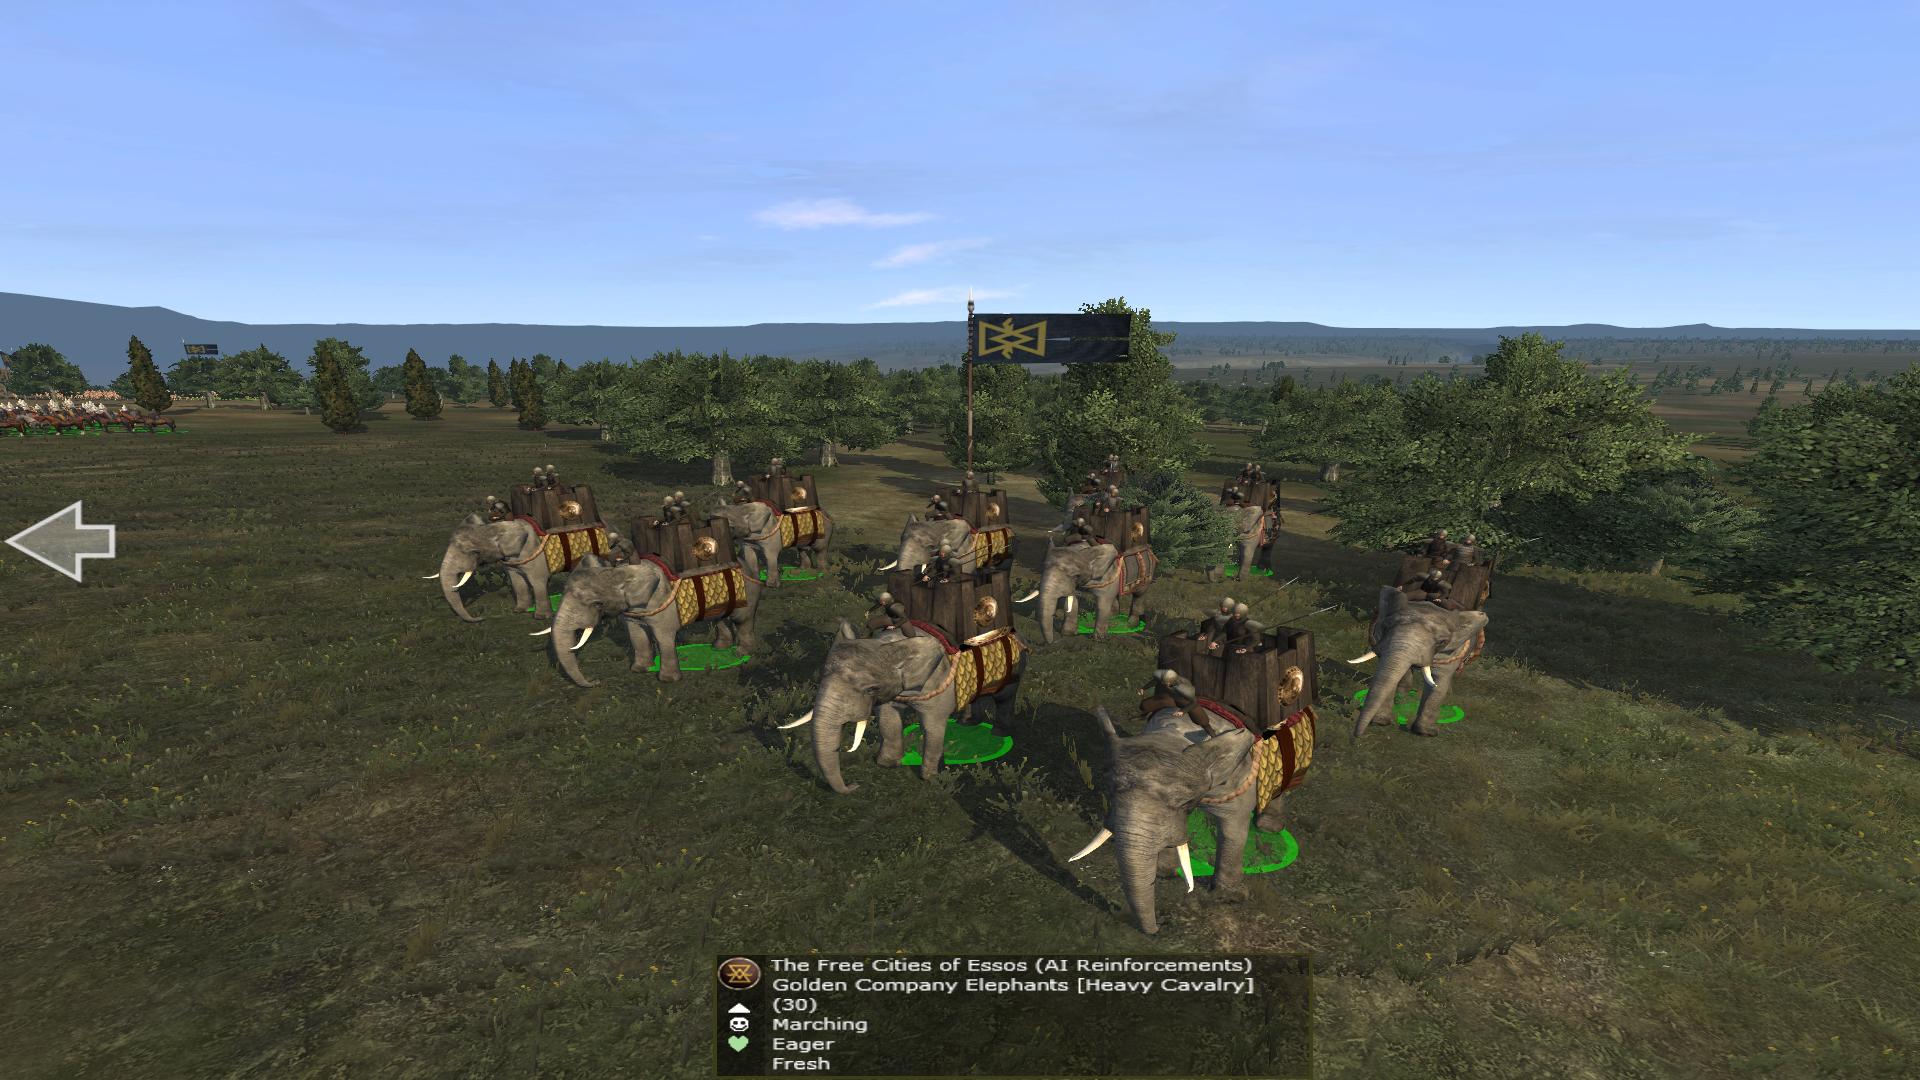 New updated Golden Company Elephants!